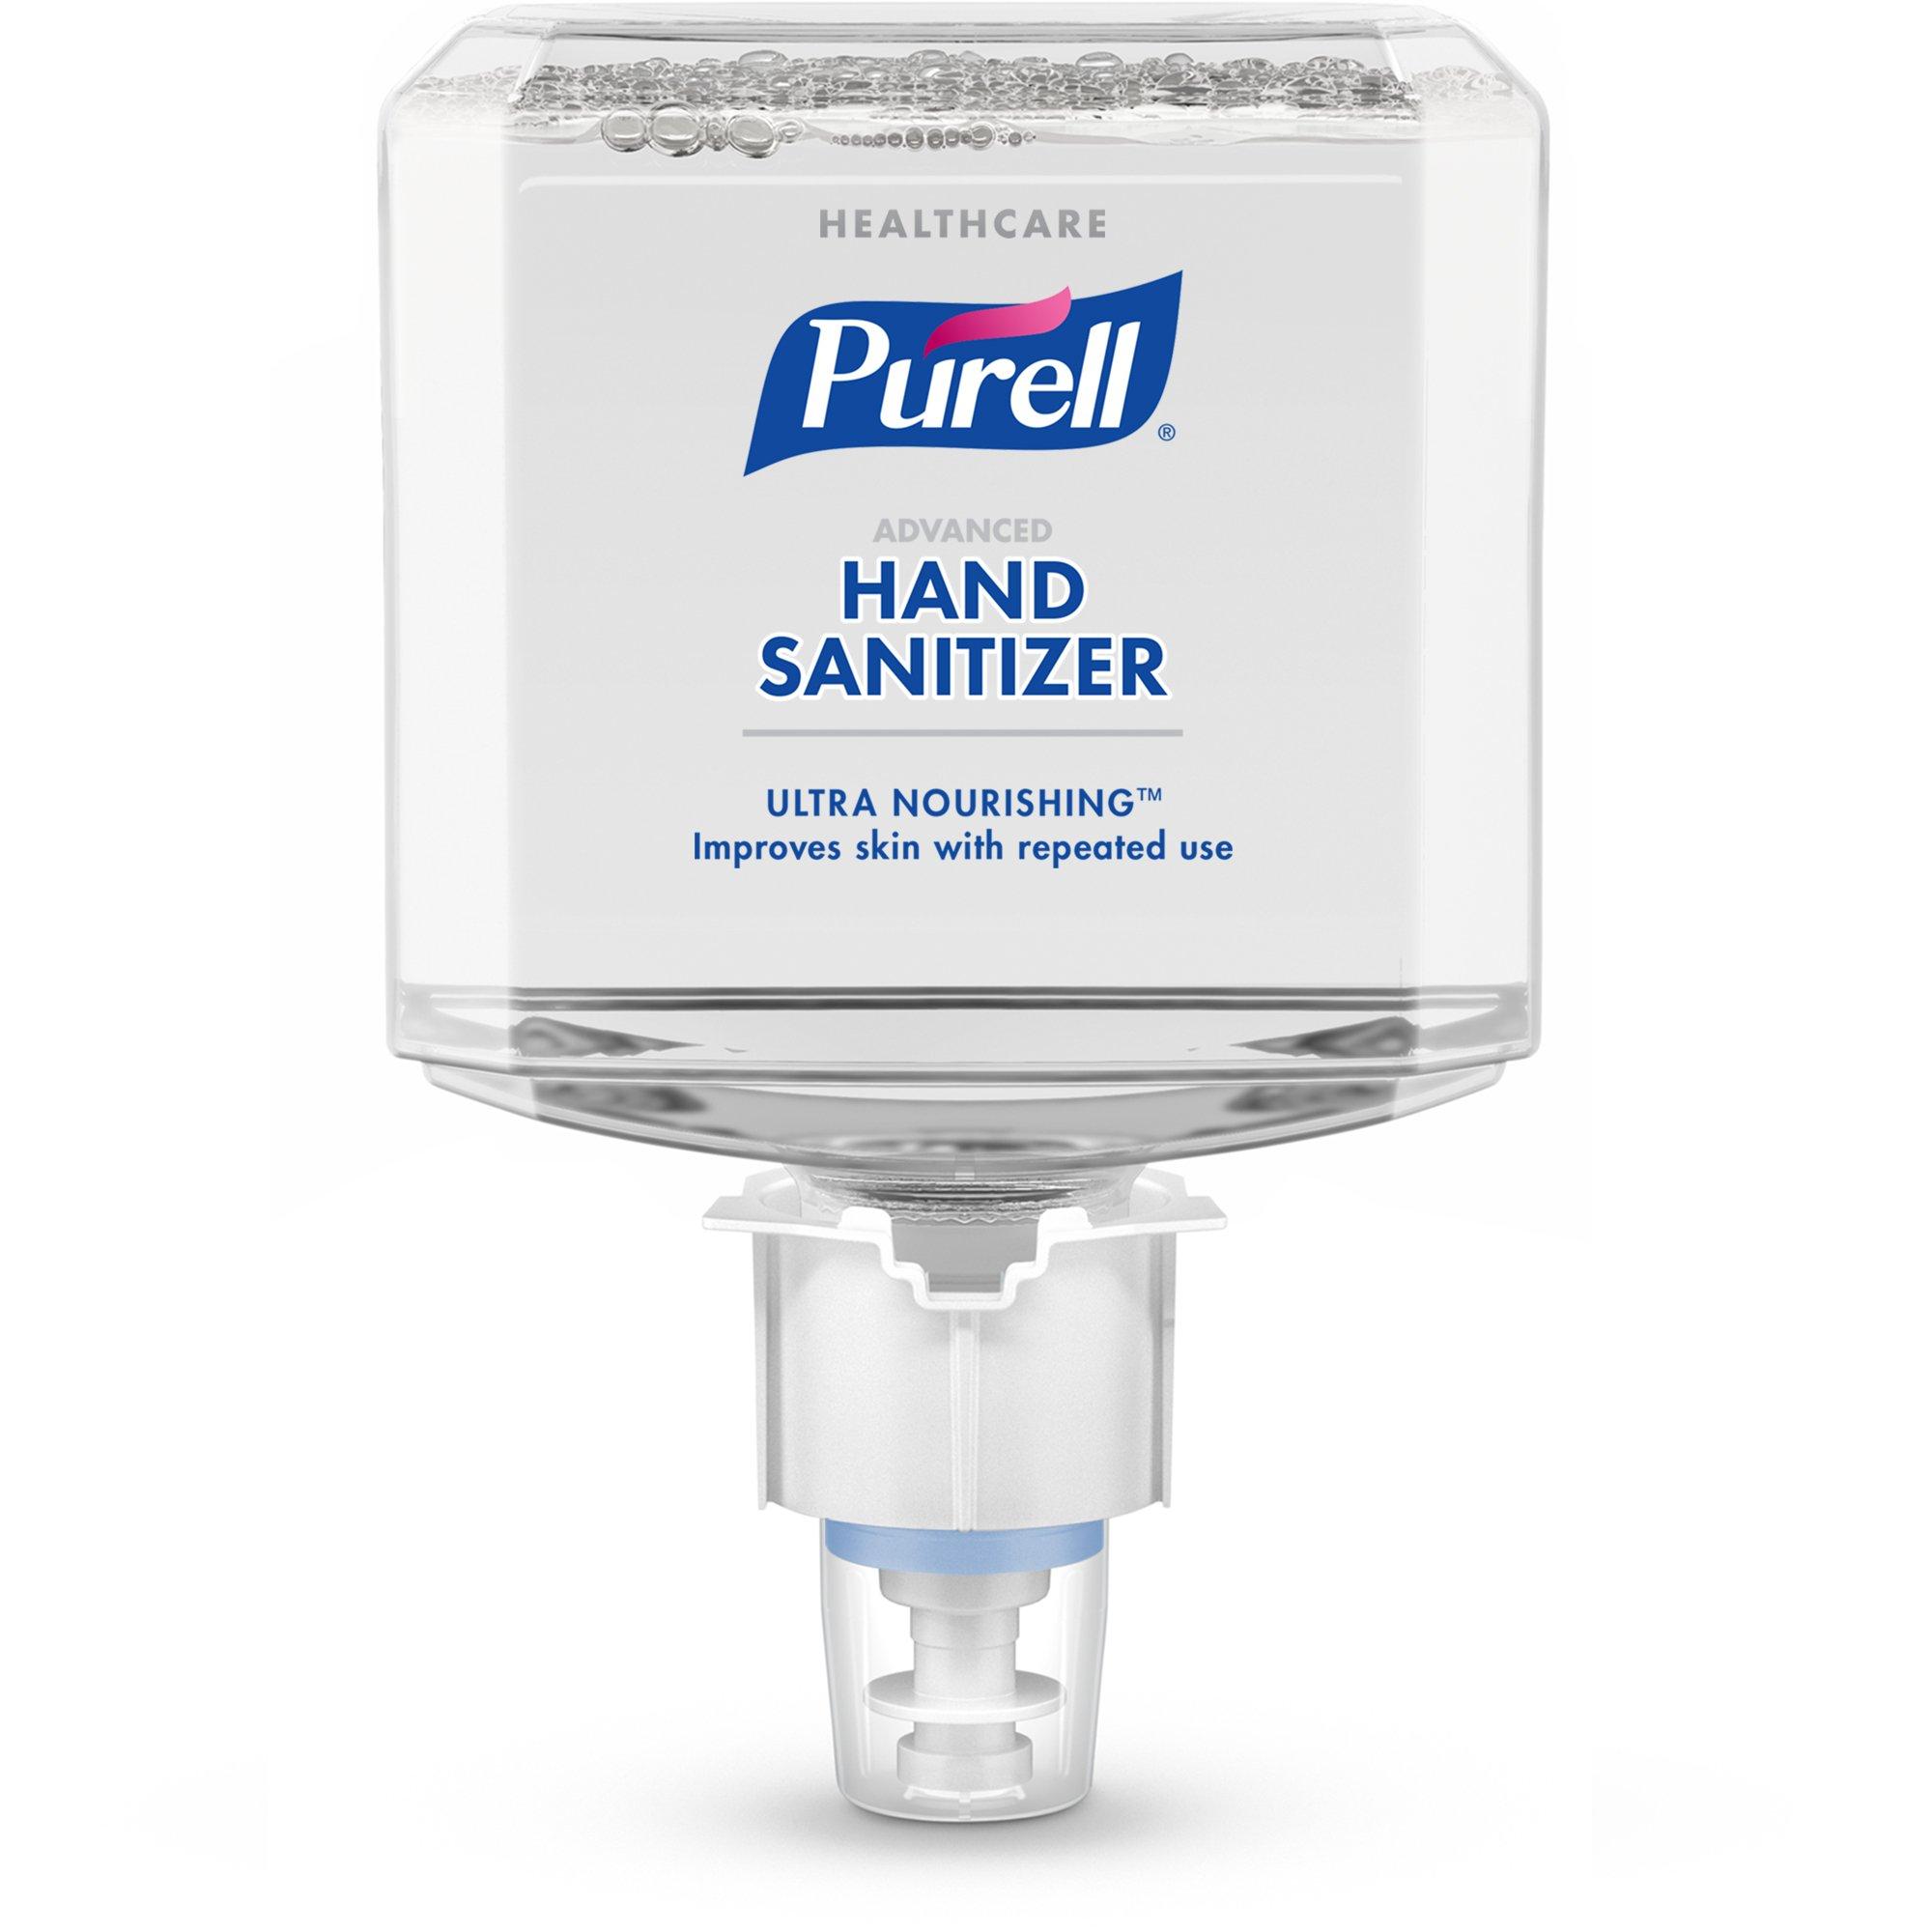 PURELL Healthcare Advanced Hand Sanitizer Foam Refill, Ultra Nourishing, 1200mL Refill for ES4 Hand Sanitizer Dispenser (Pack of 2) - 5056-02